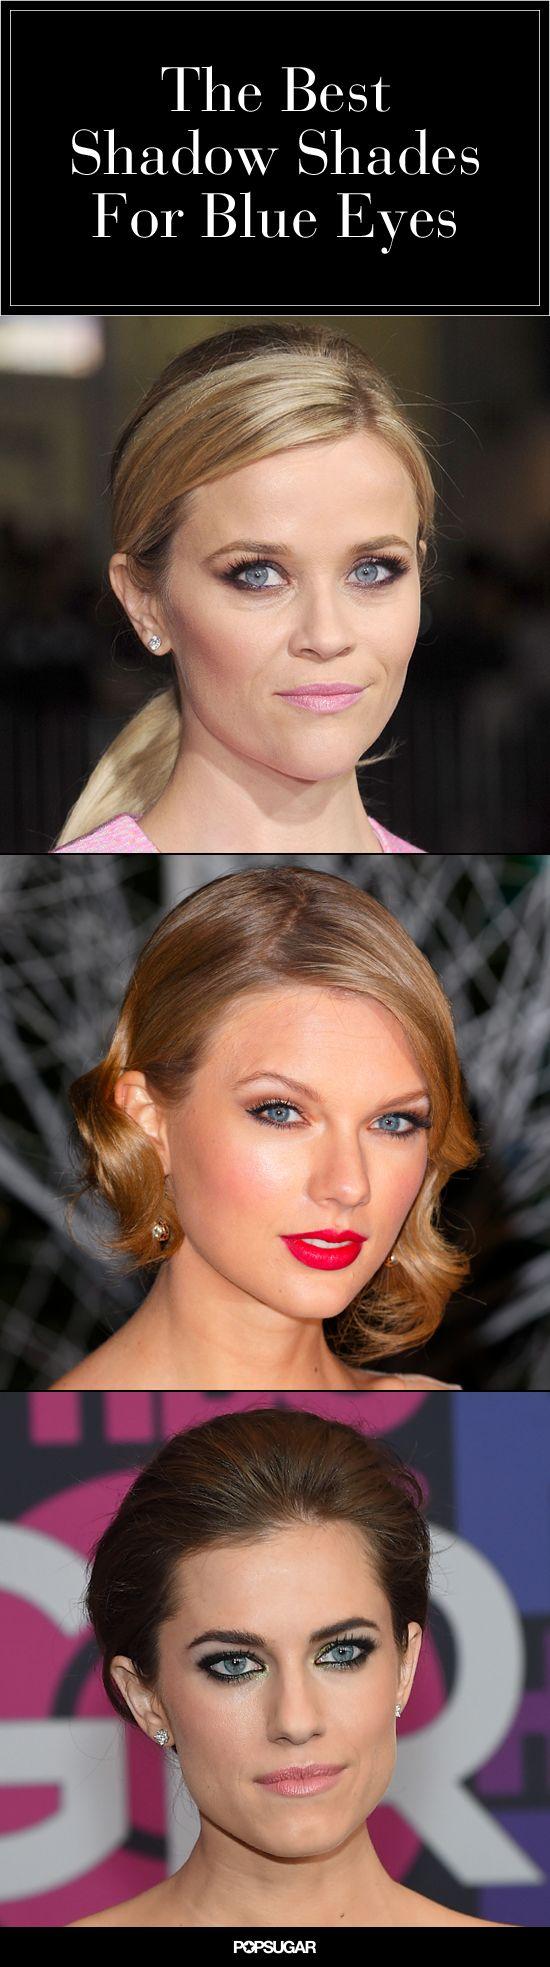 Eyeshadow 101: How to Make Blue Eyes Pop